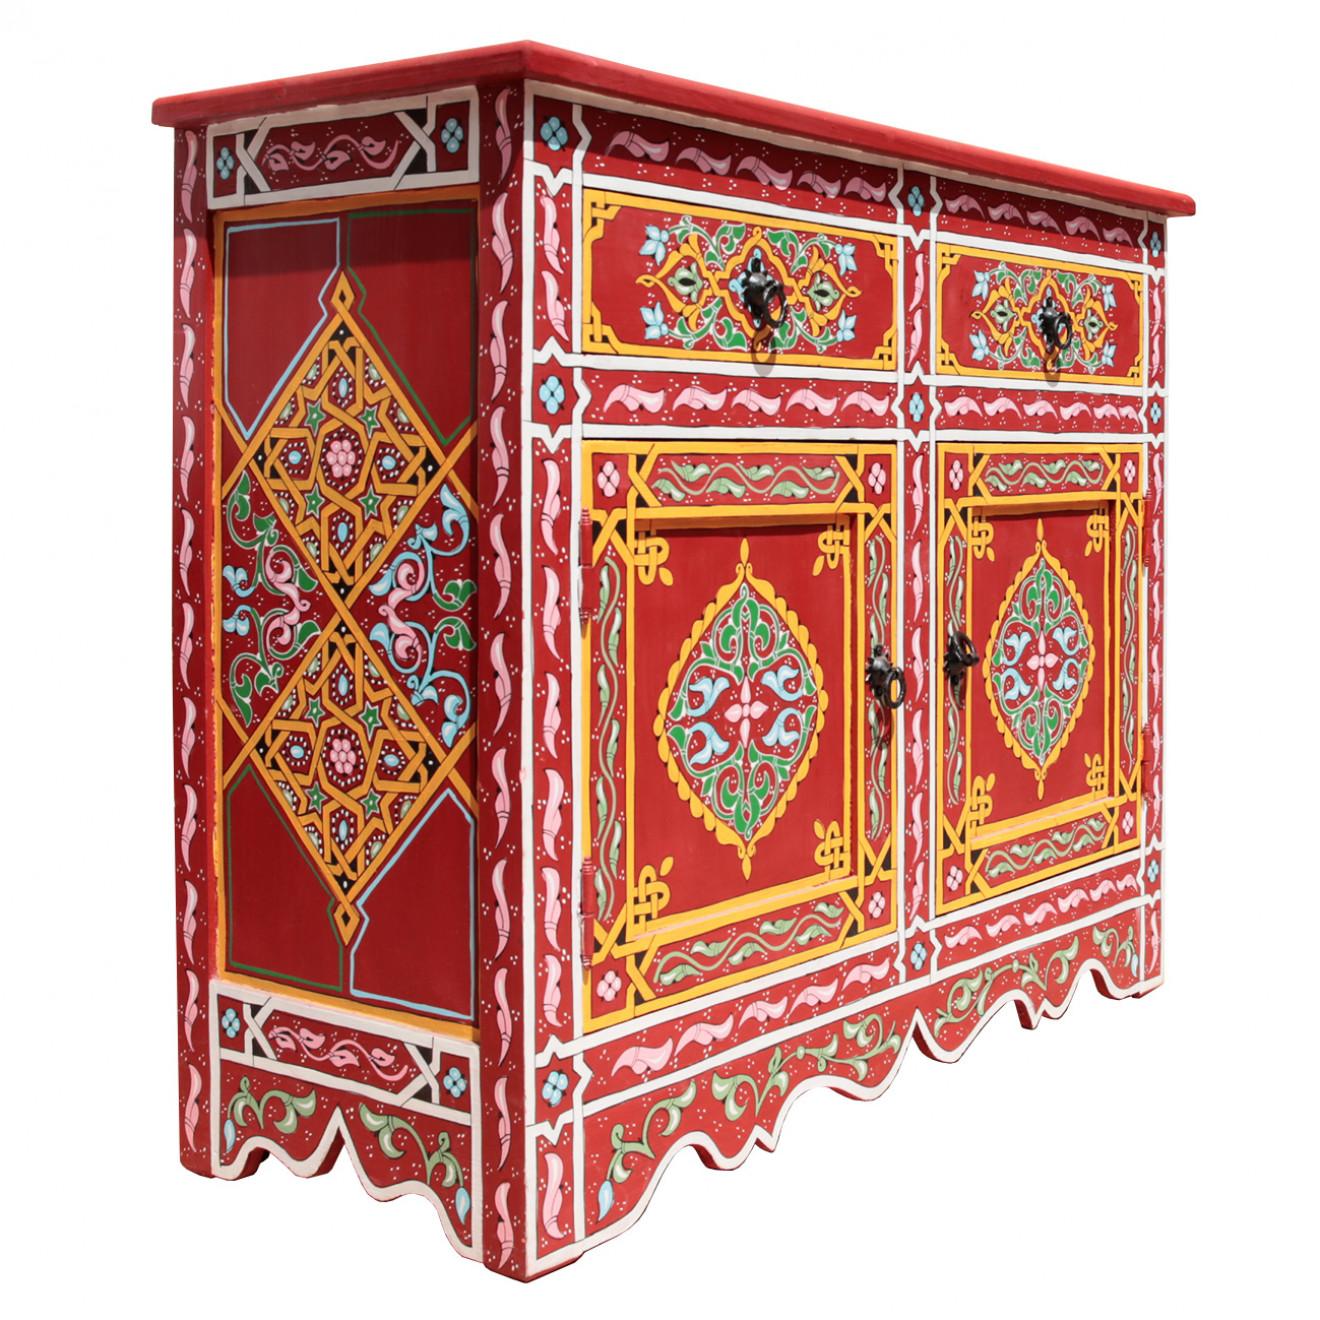 orientalische arabische marokkanische kommode schrank. Black Bedroom Furniture Sets. Home Design Ideas